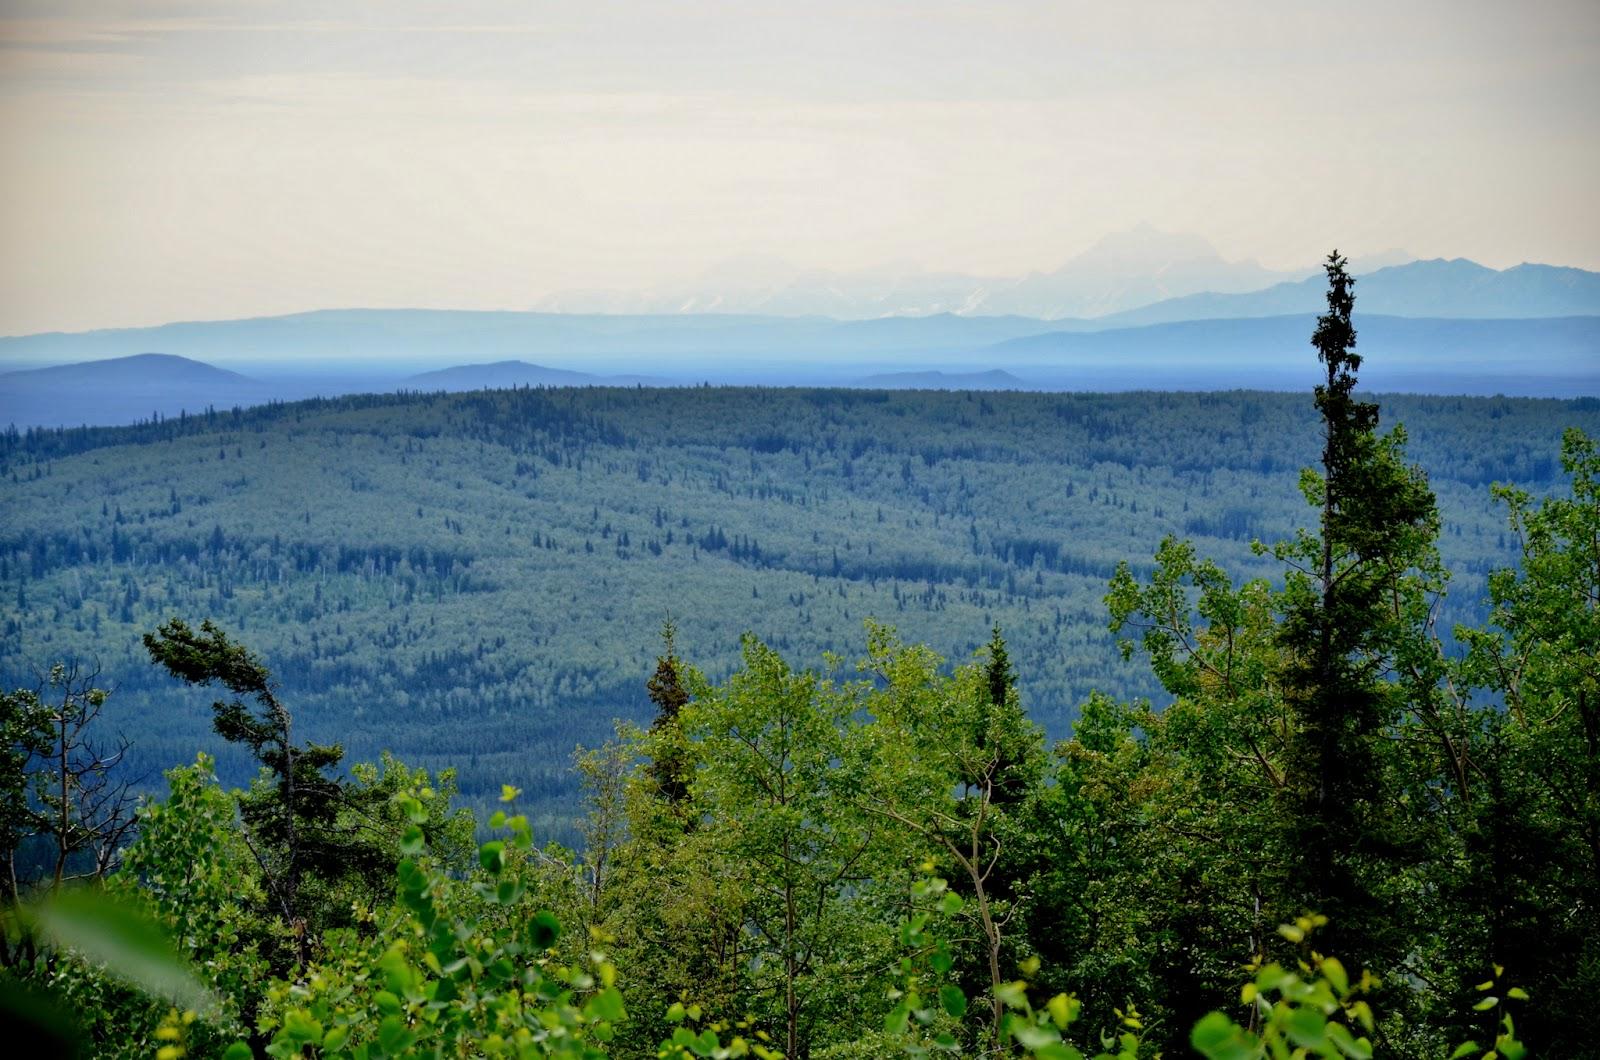 Wonderful landscape as we drive north from Denali, Alaska